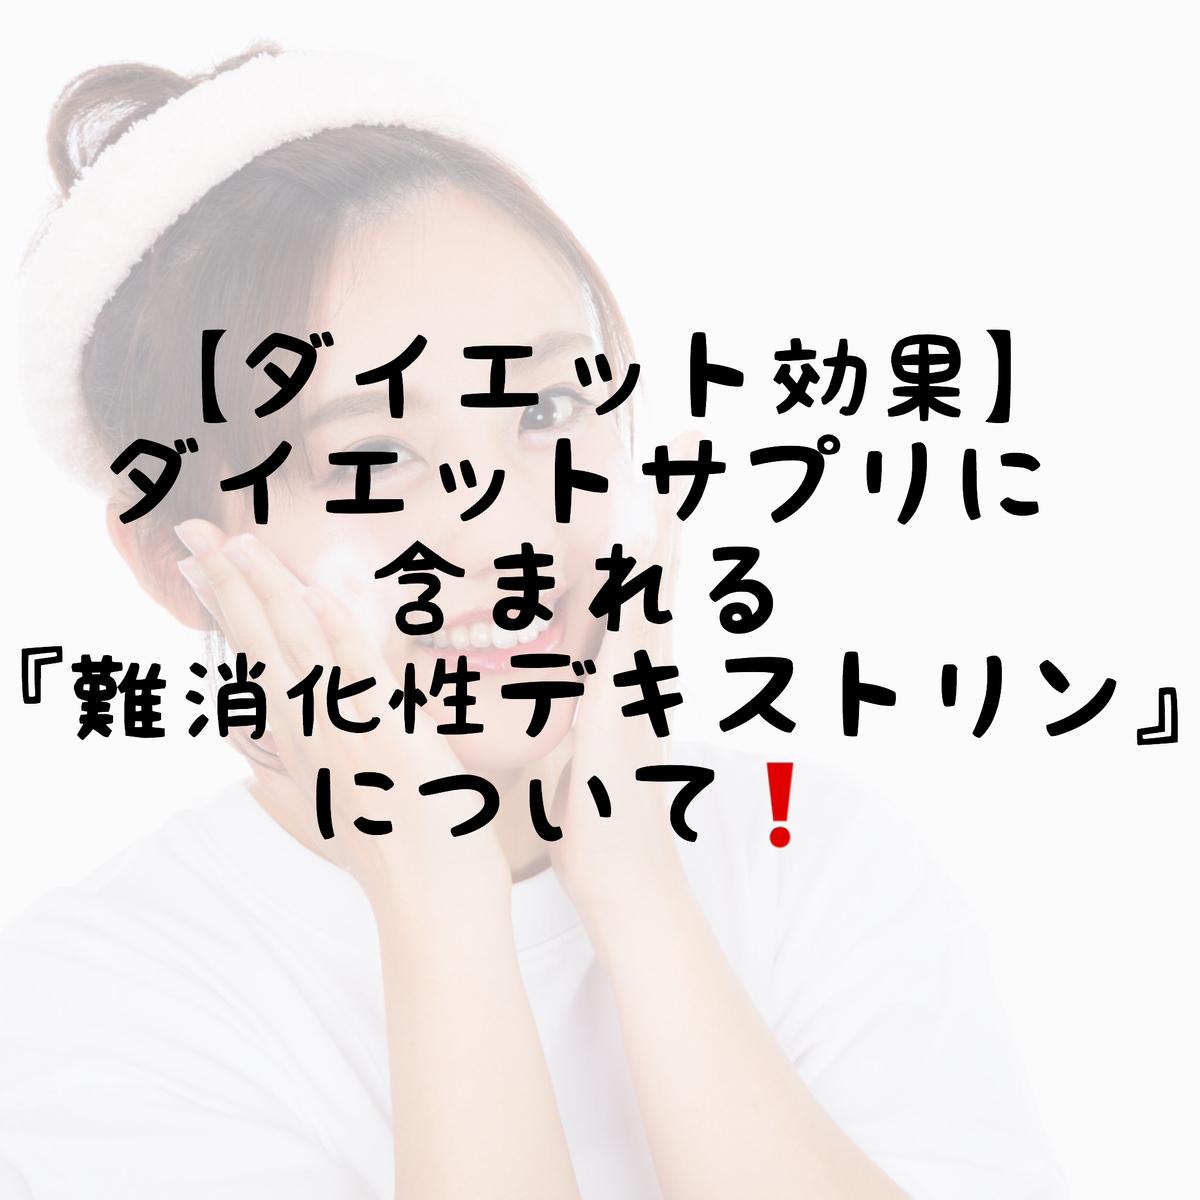 f:id:nokonoko_o:20200527191506j:plain